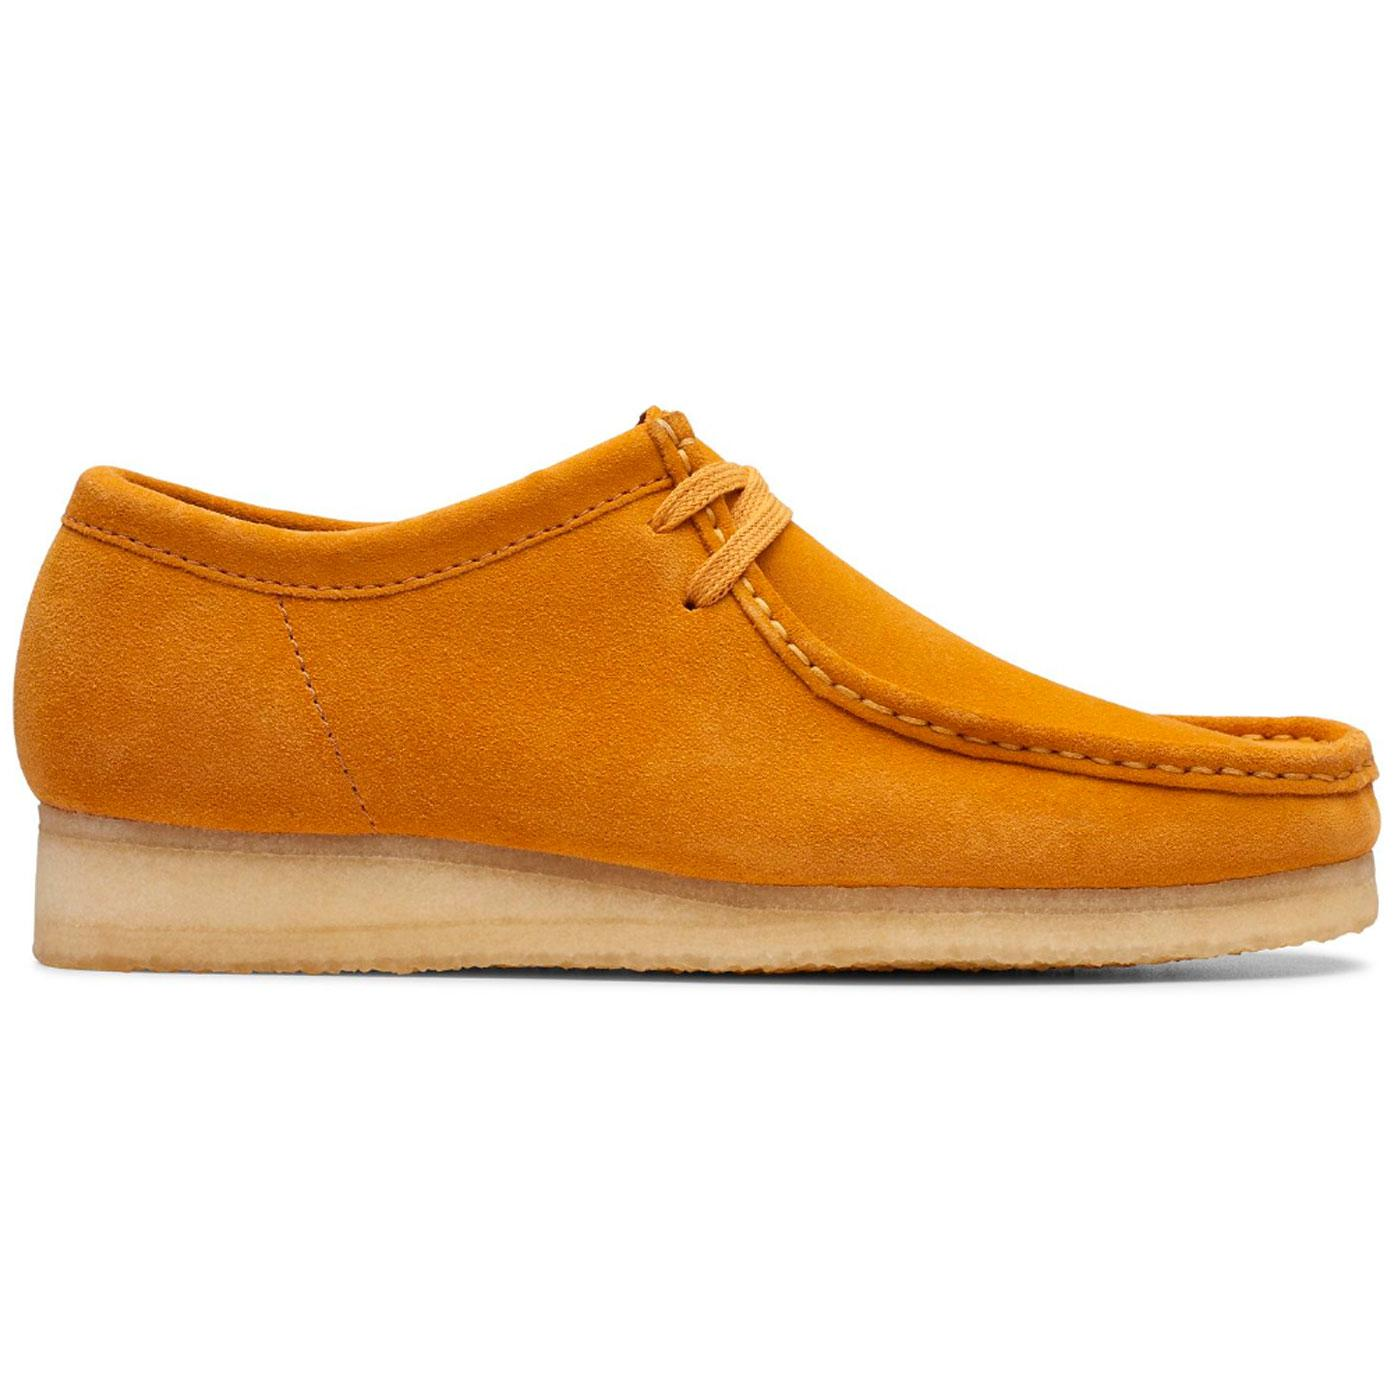 CLARKS ORIGINALS Wallabee Mod Moccasin Shoes Turmeric